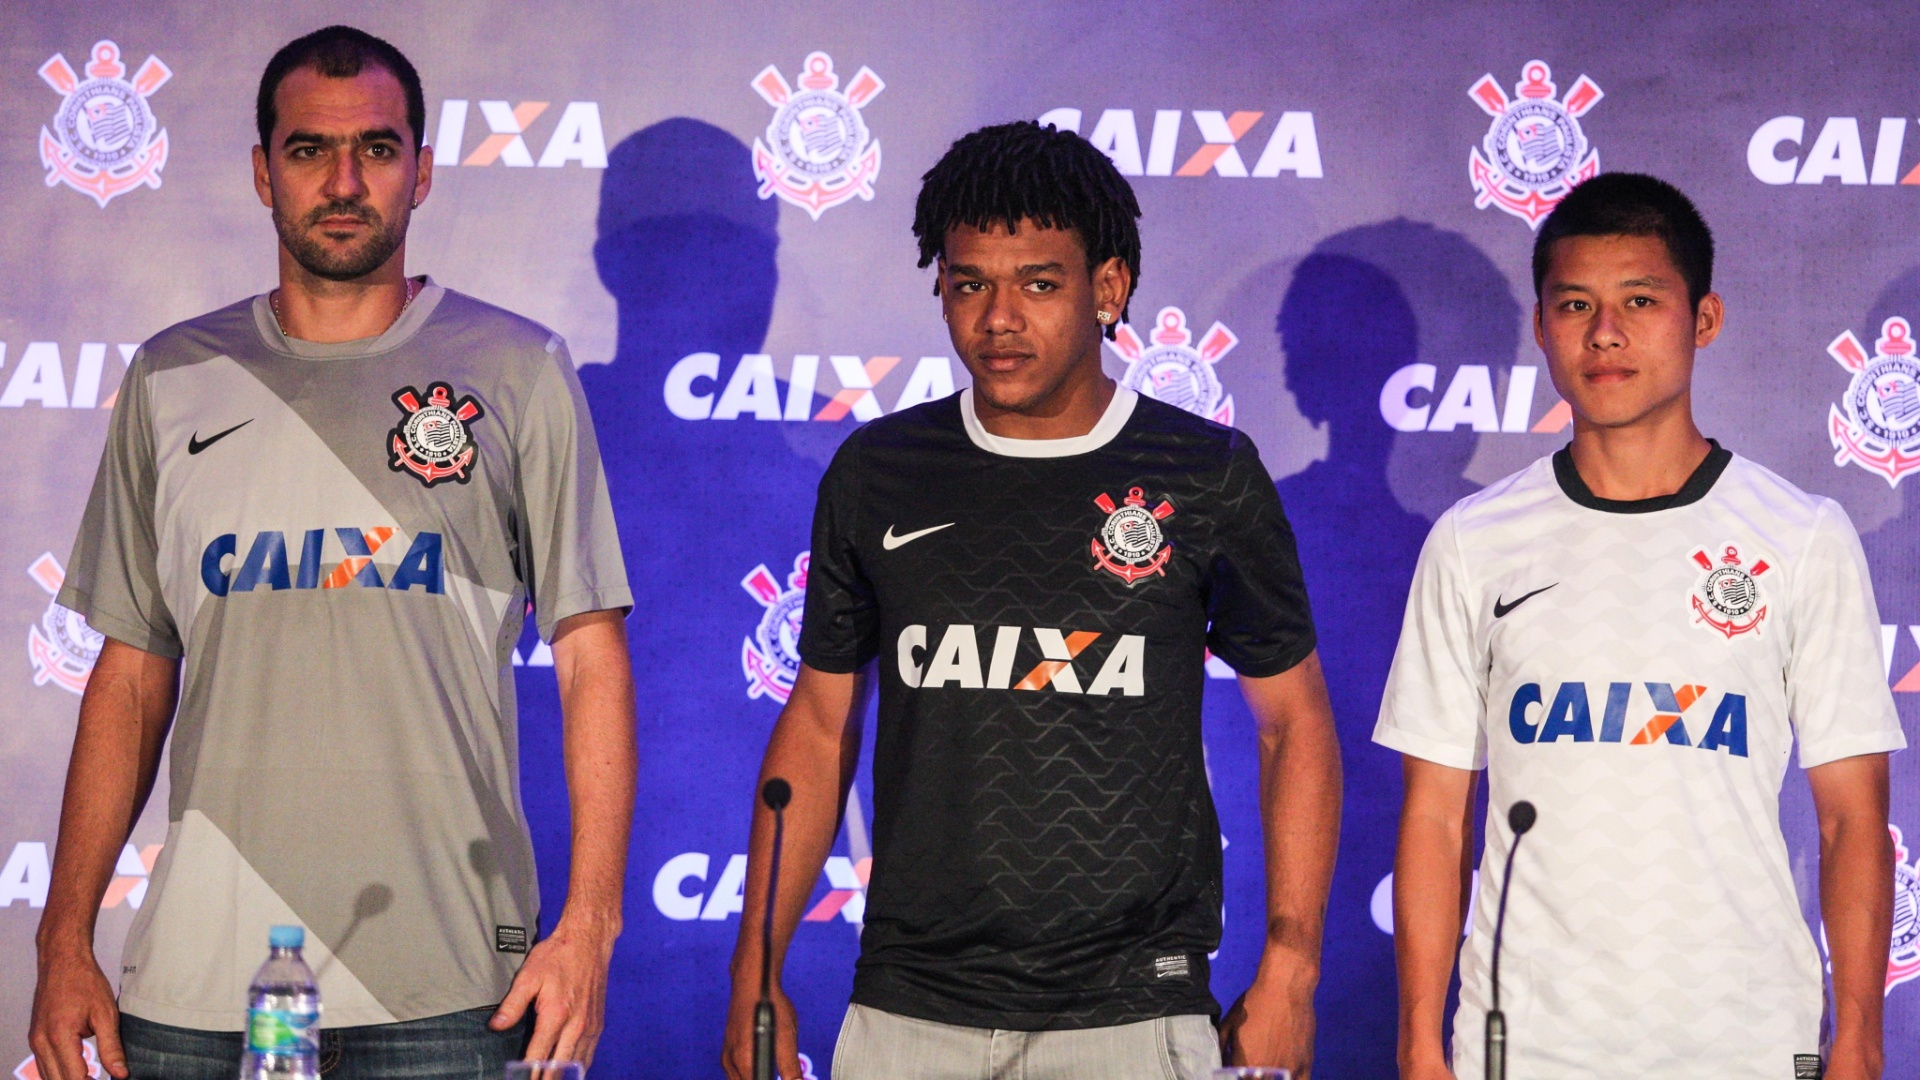 Justiça libera e Corinthians voltará a receber verba da Caixa Econômica